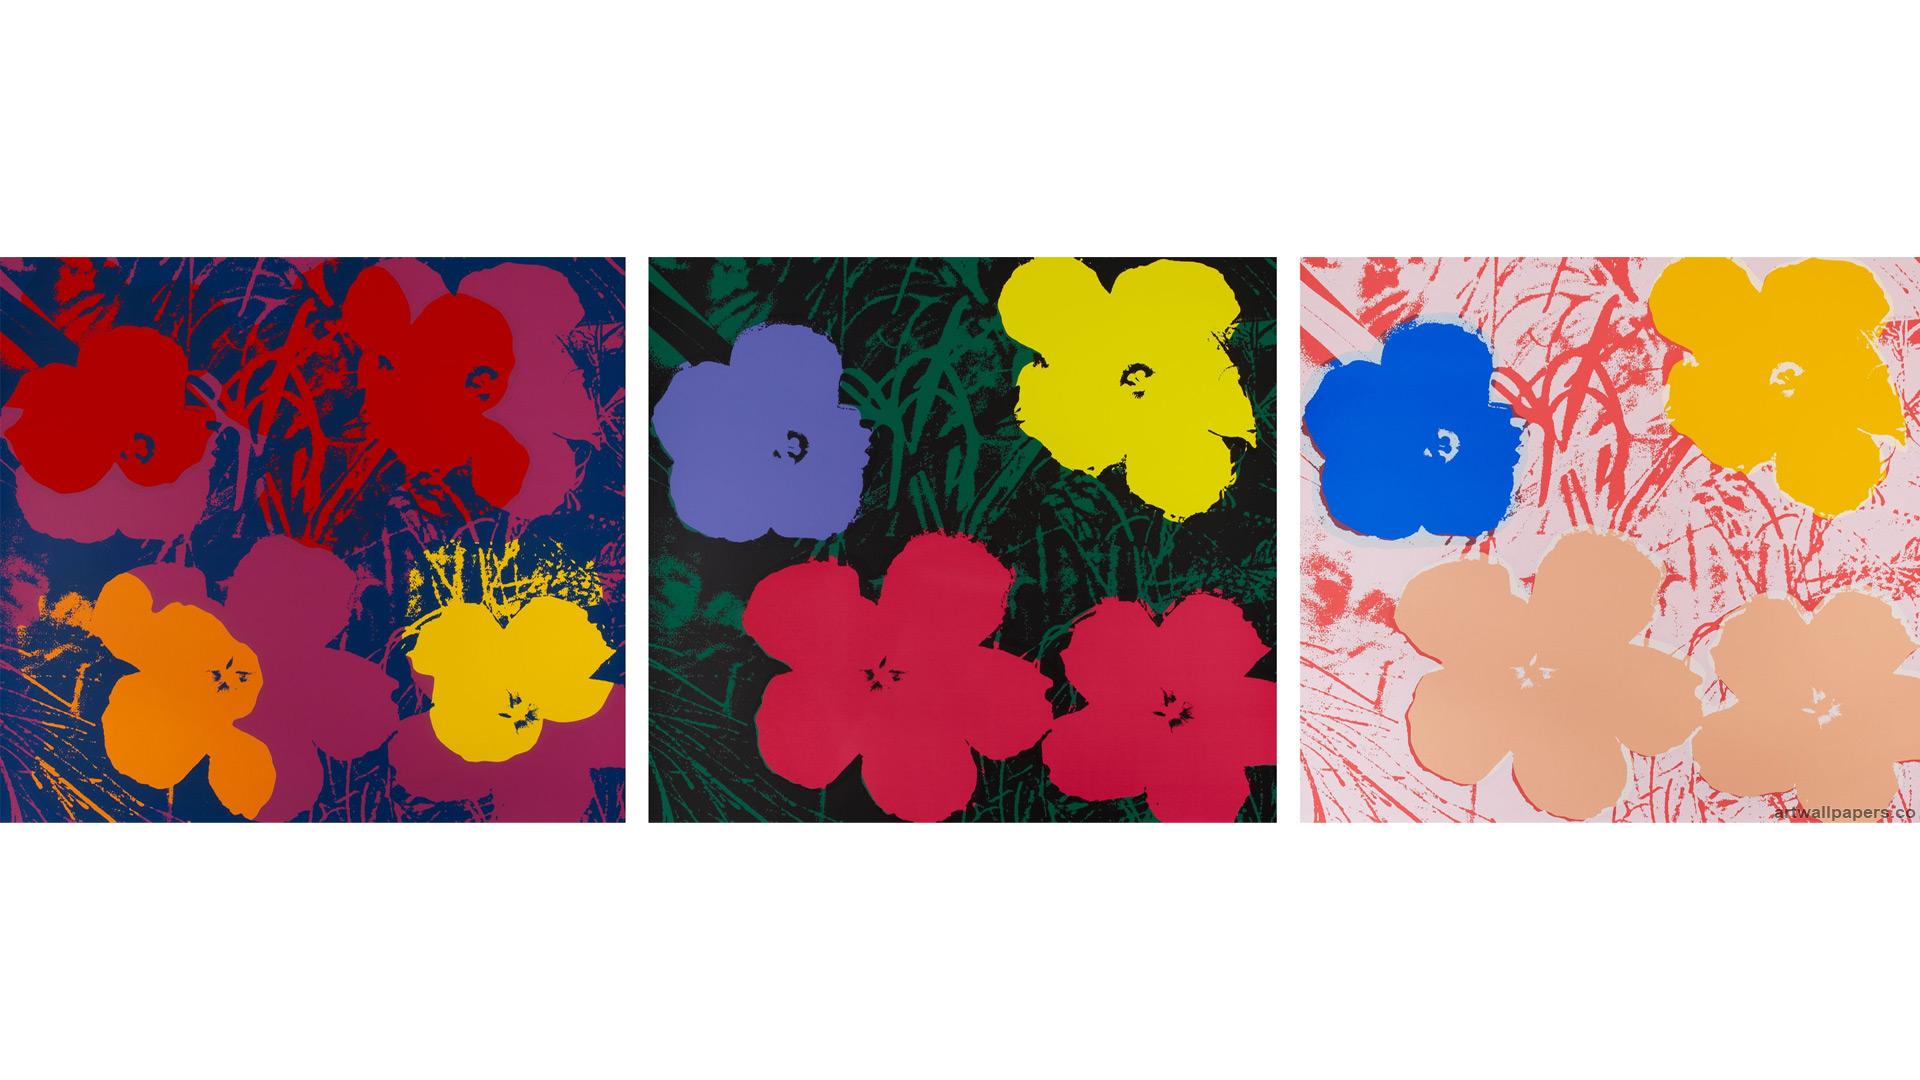 Andy Warhol Wallpapers Desktop Art Backgrounds 1920x1080